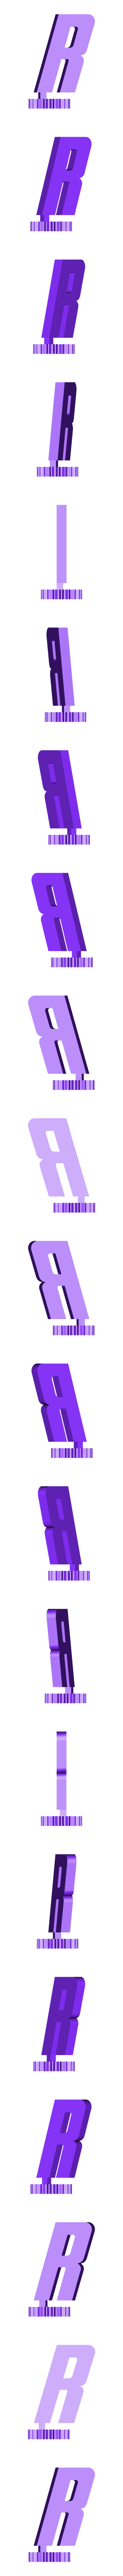 R, Avengers Logo.STL Download free STL file Avengers Rotating Logo • 3D printing template, potentprintables